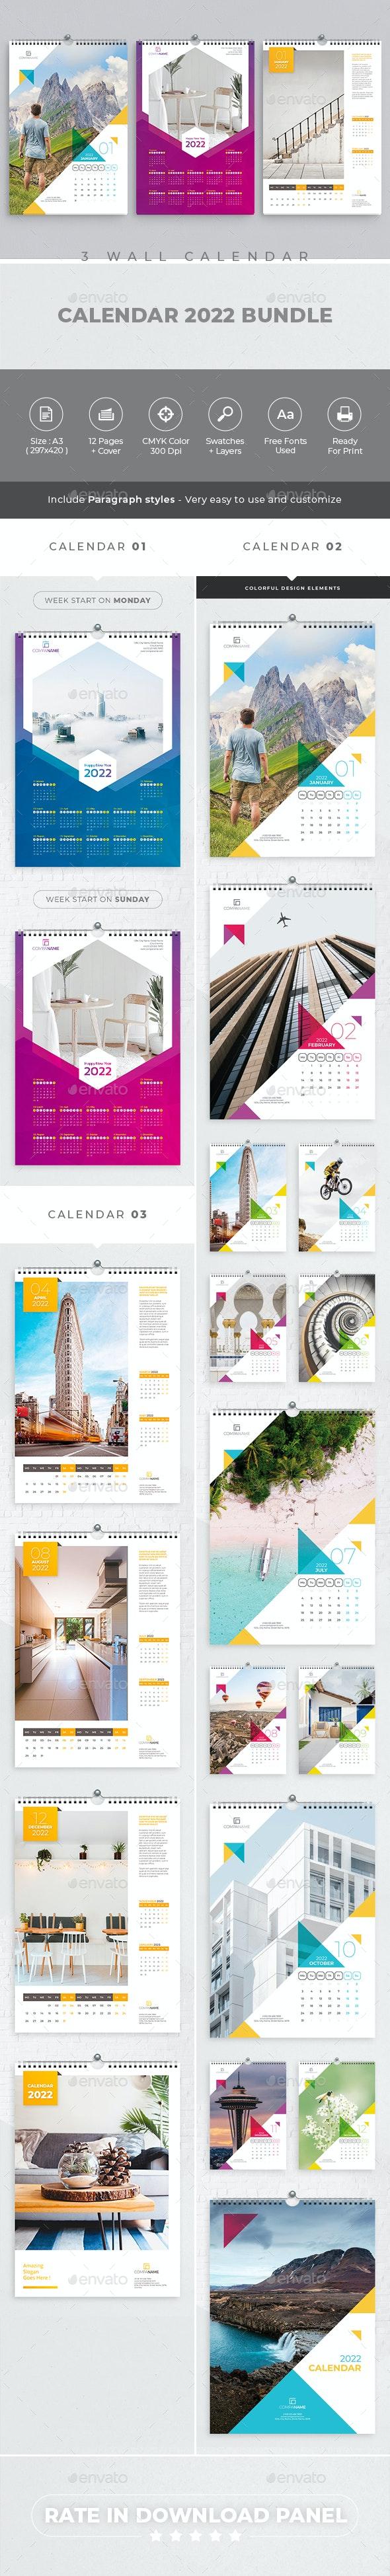 Wall Calendar 2022 Bundle V03 - Calendars Stationery